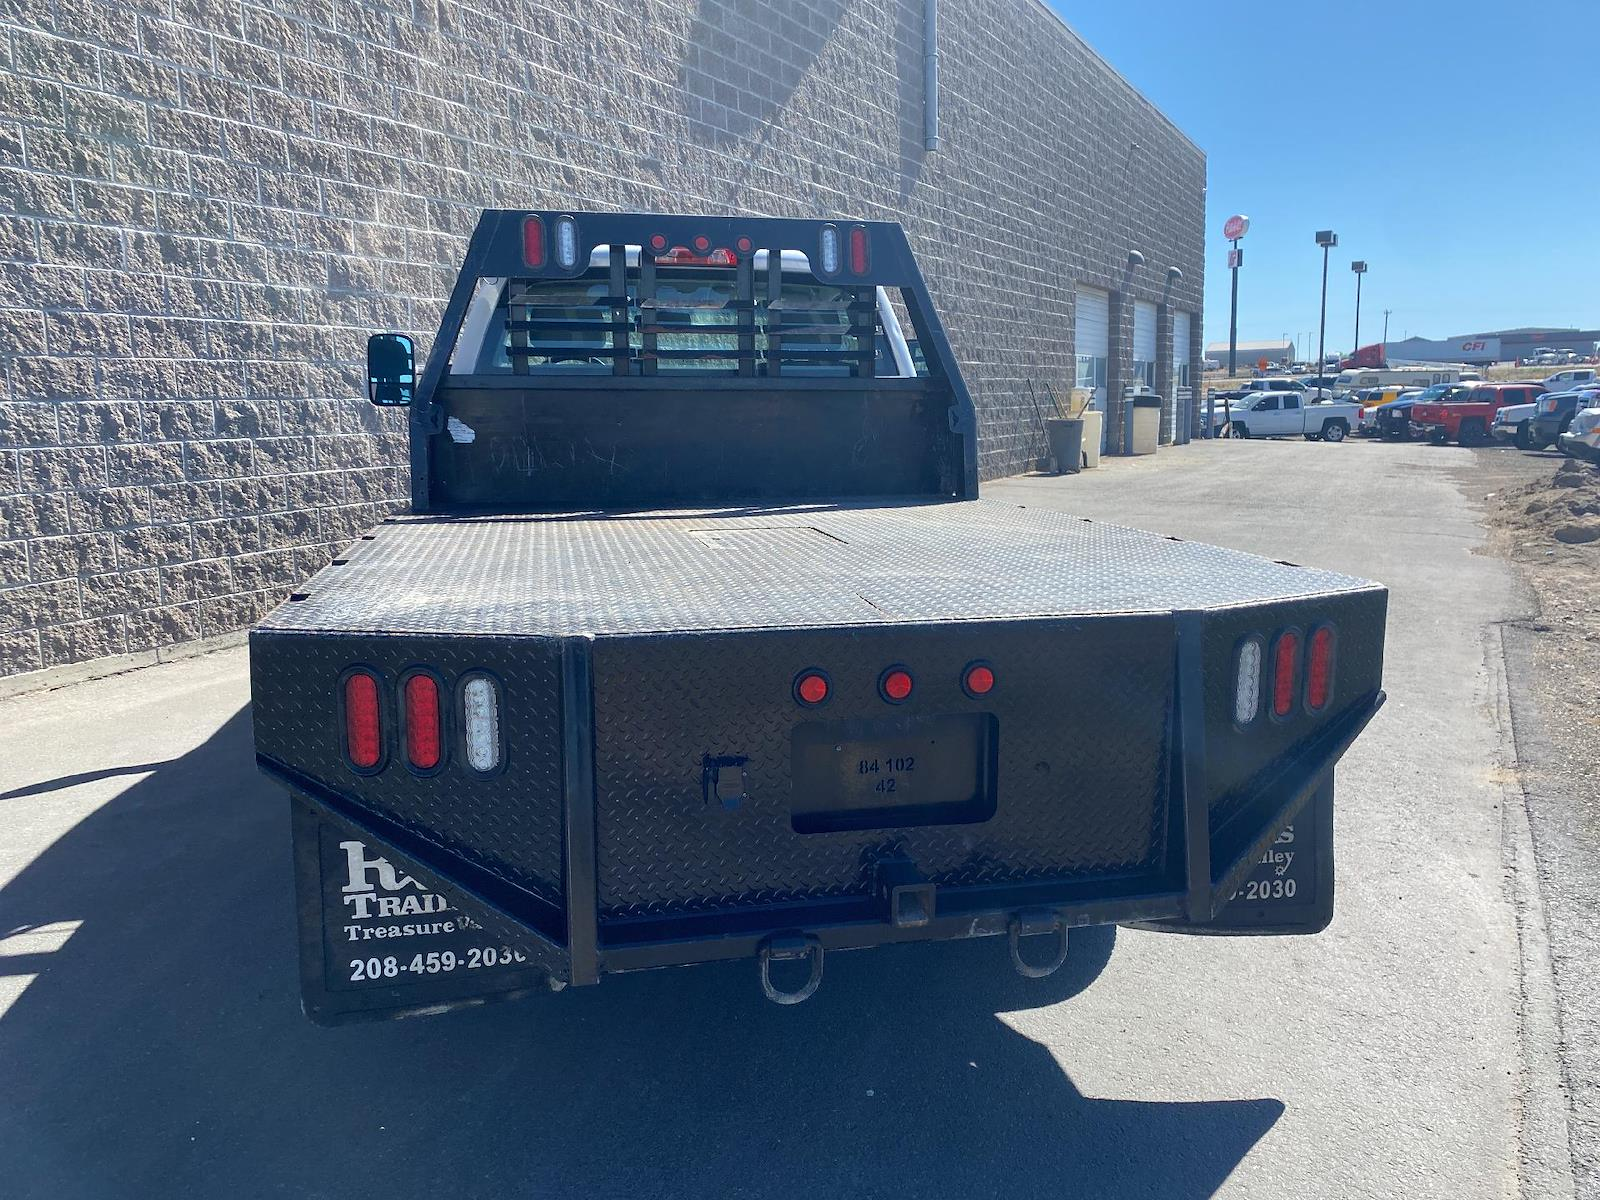 2018 Chevrolet Silverado 2500 Regular Cab 4x4, Platform Body #U6034 - photo 1